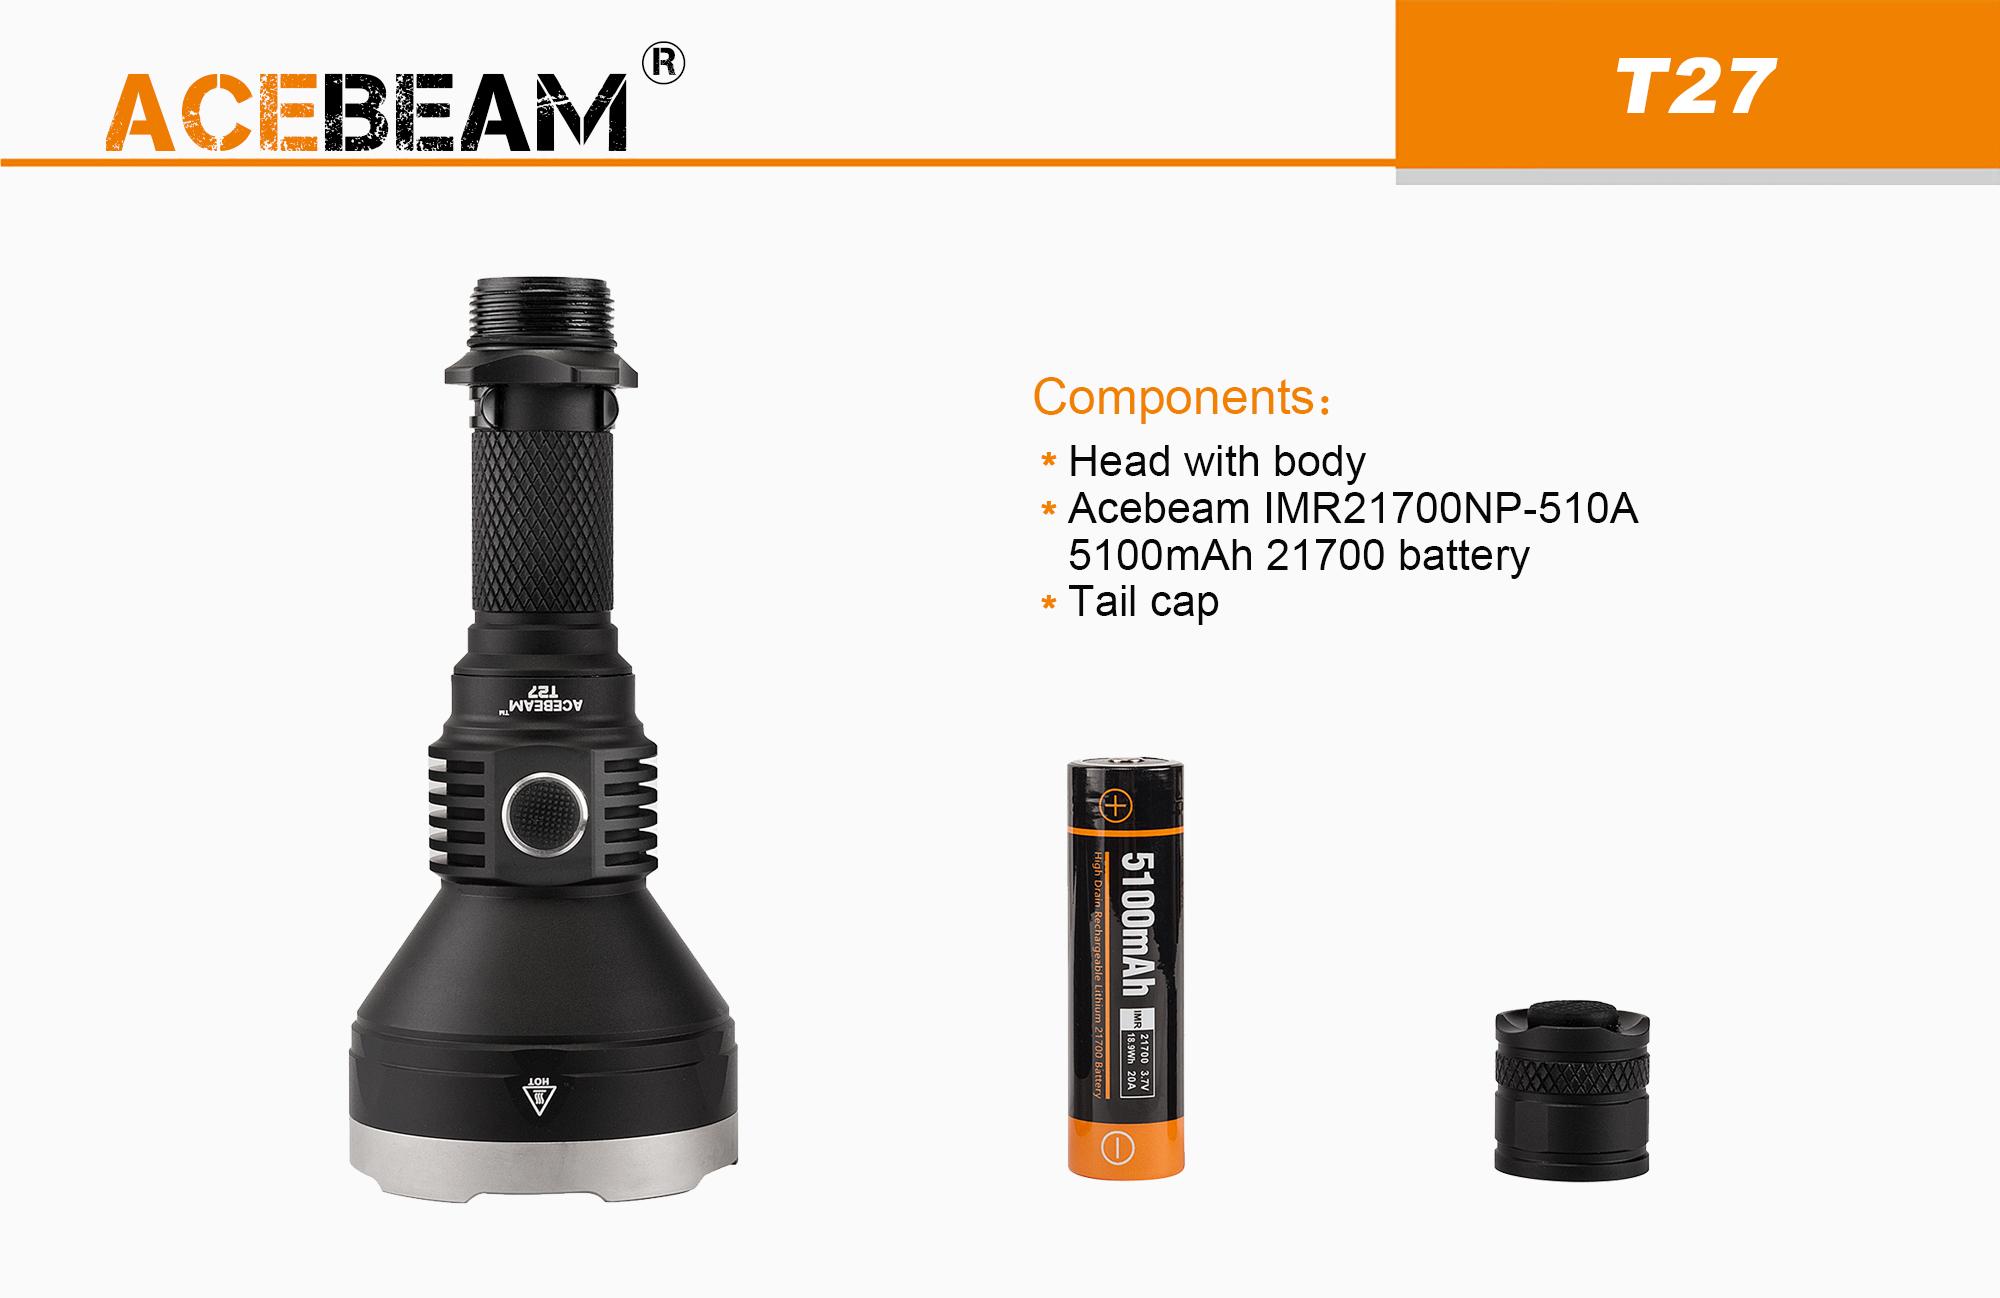 T27 C Usb Torche Lampe Acebeam 2500lumens Rechargeable b6gYyf7v